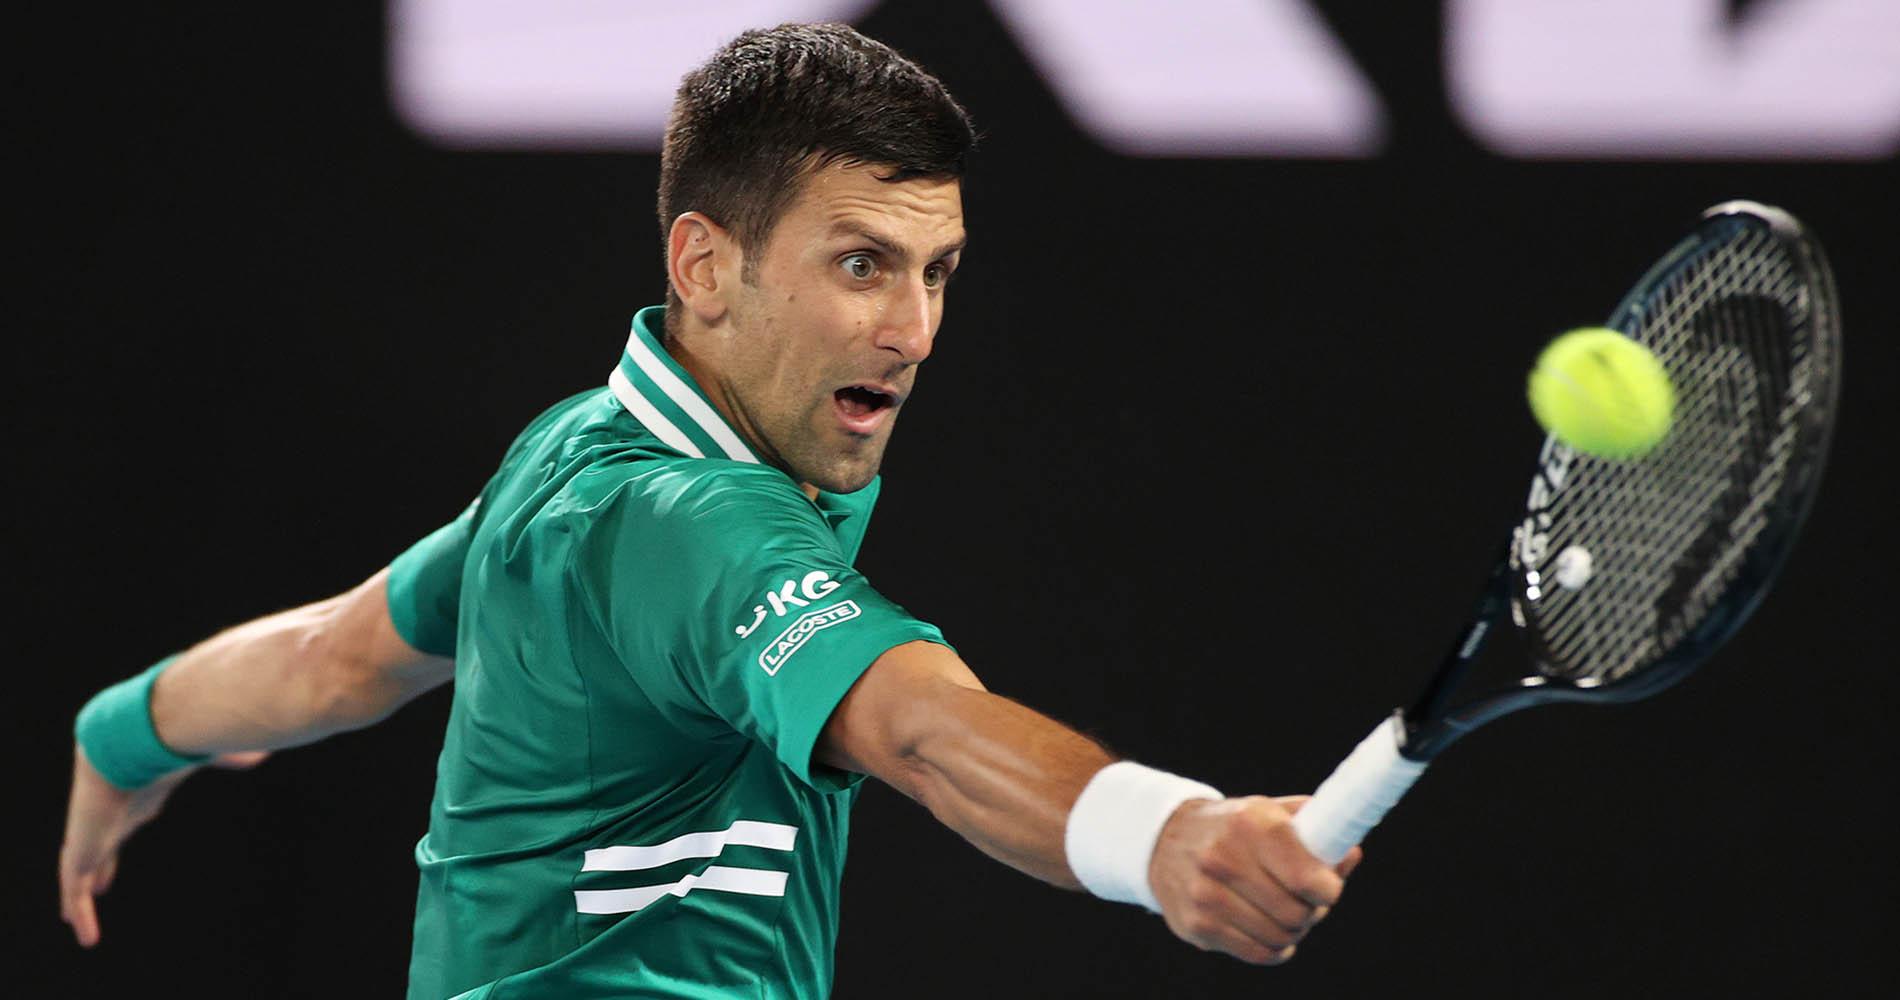 Djokovic 2021 Australian Open quarterfinal